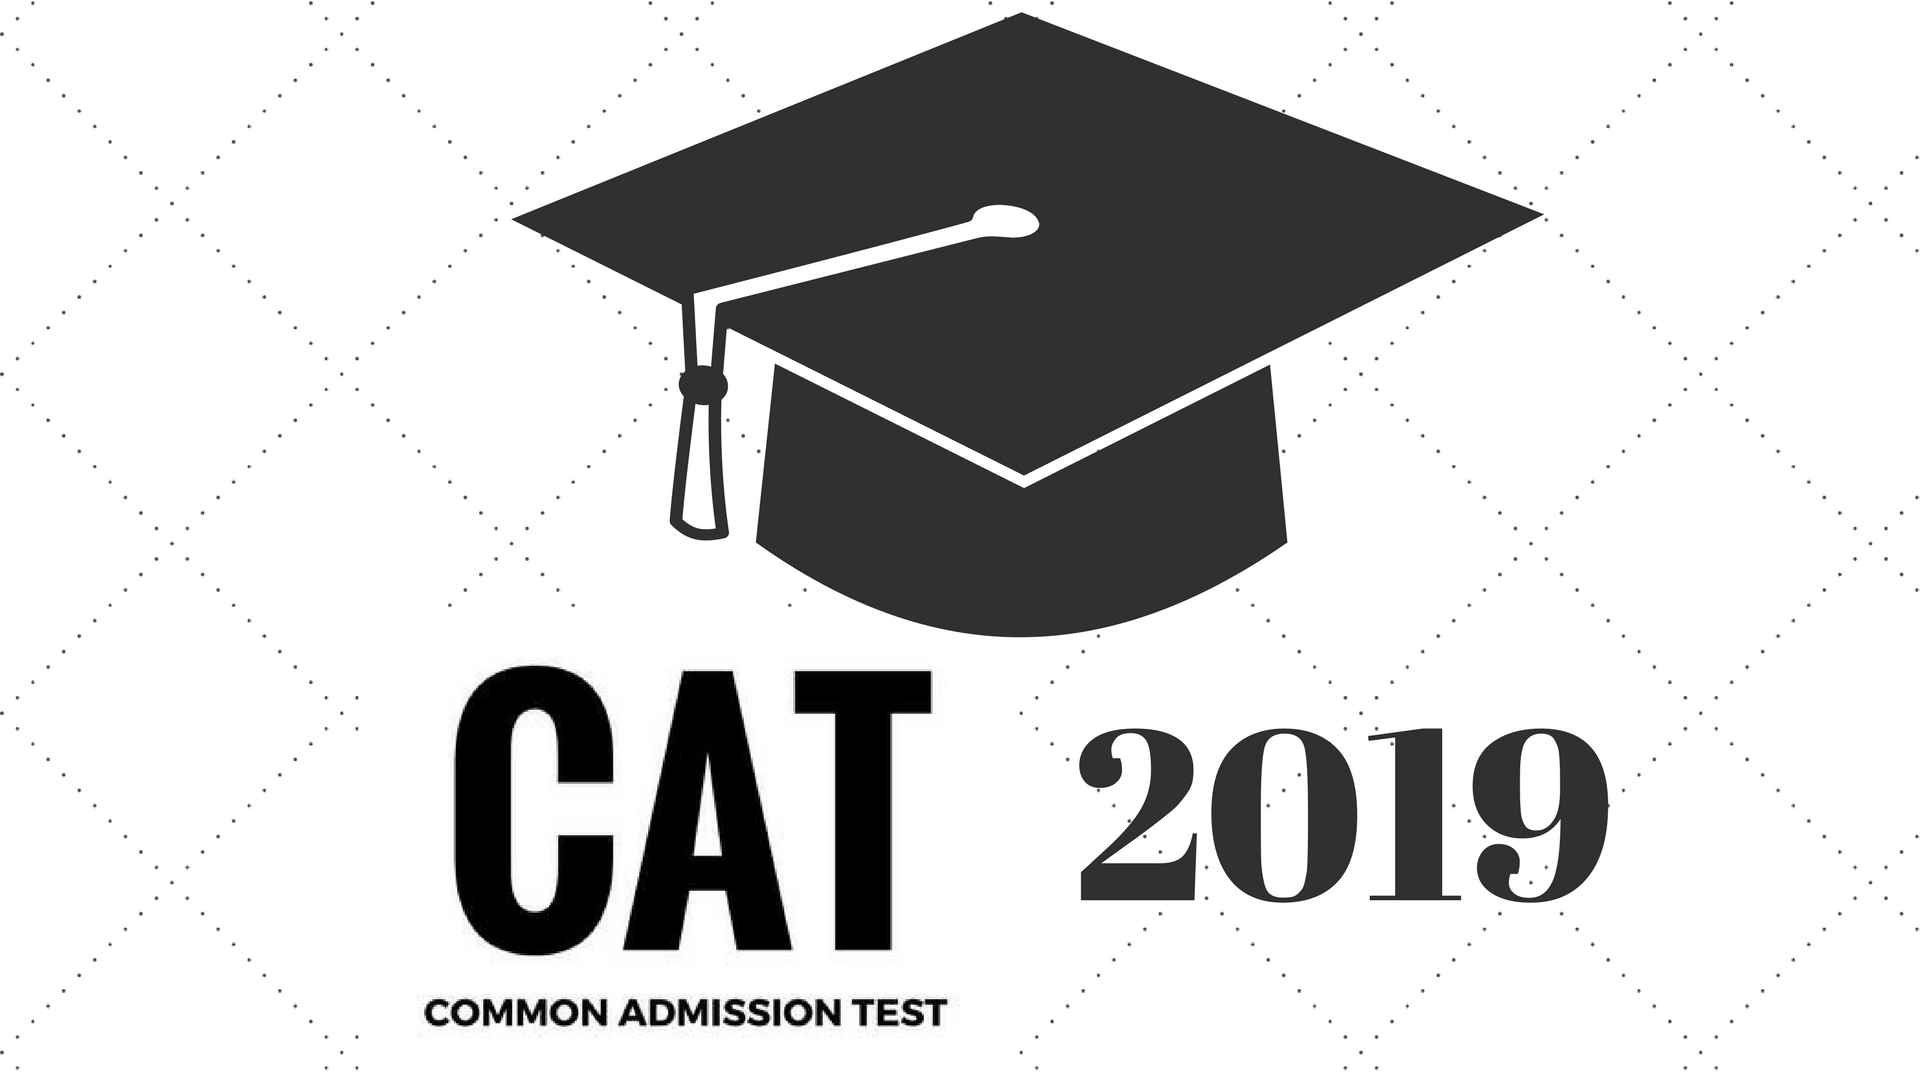 CAT 2019 Exam   Eligibility, Registration Fees, Exam Pattern, Syllabus